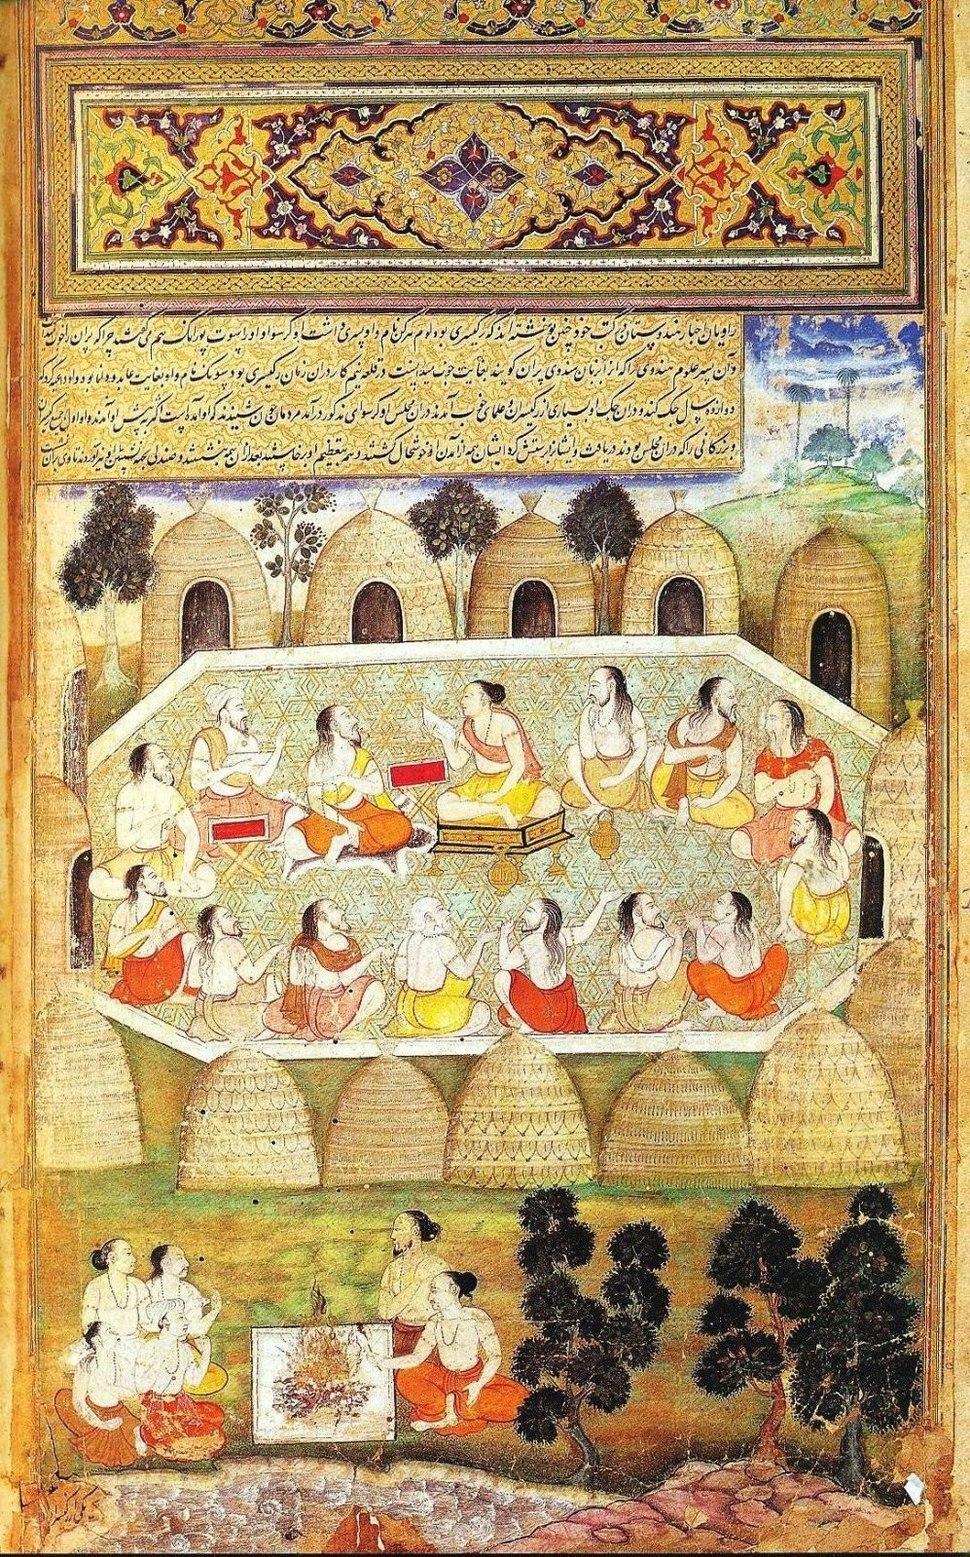 Sauti recites the slokas of the Mahabharata